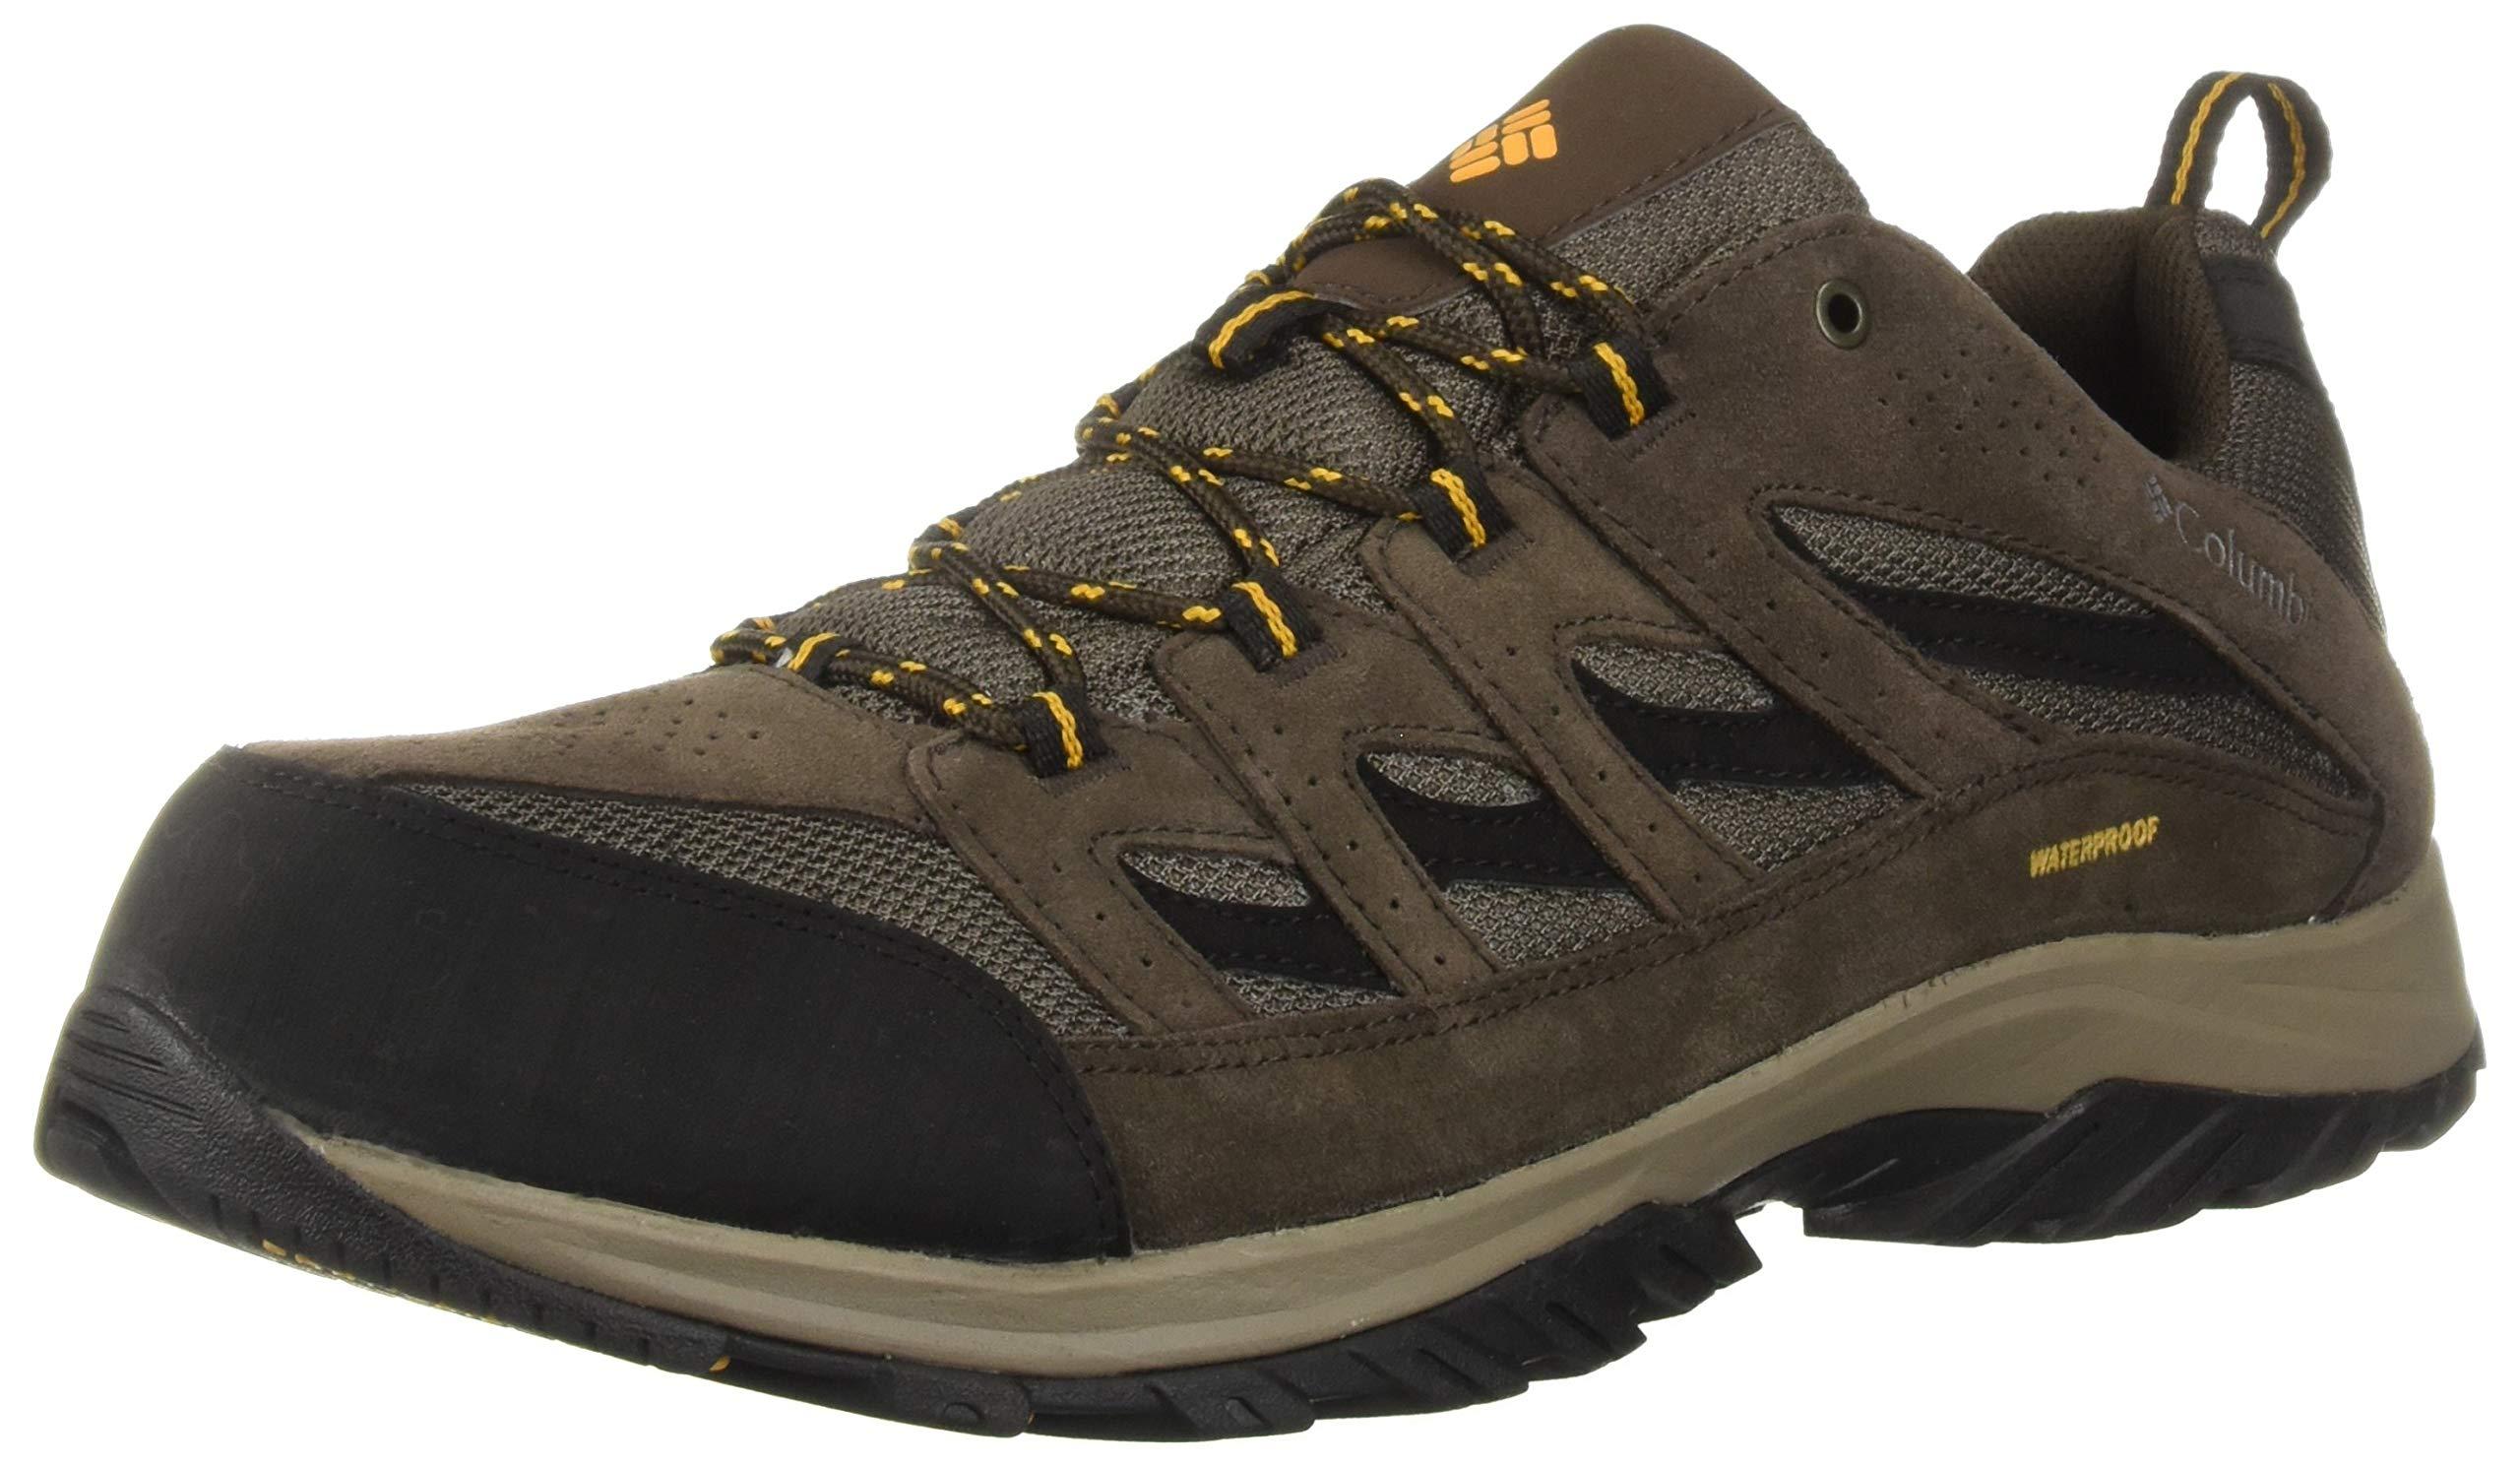 Columbia Men's Crestwood Waterproof Hiking Shoe, mud, Squash, 16 Regular US